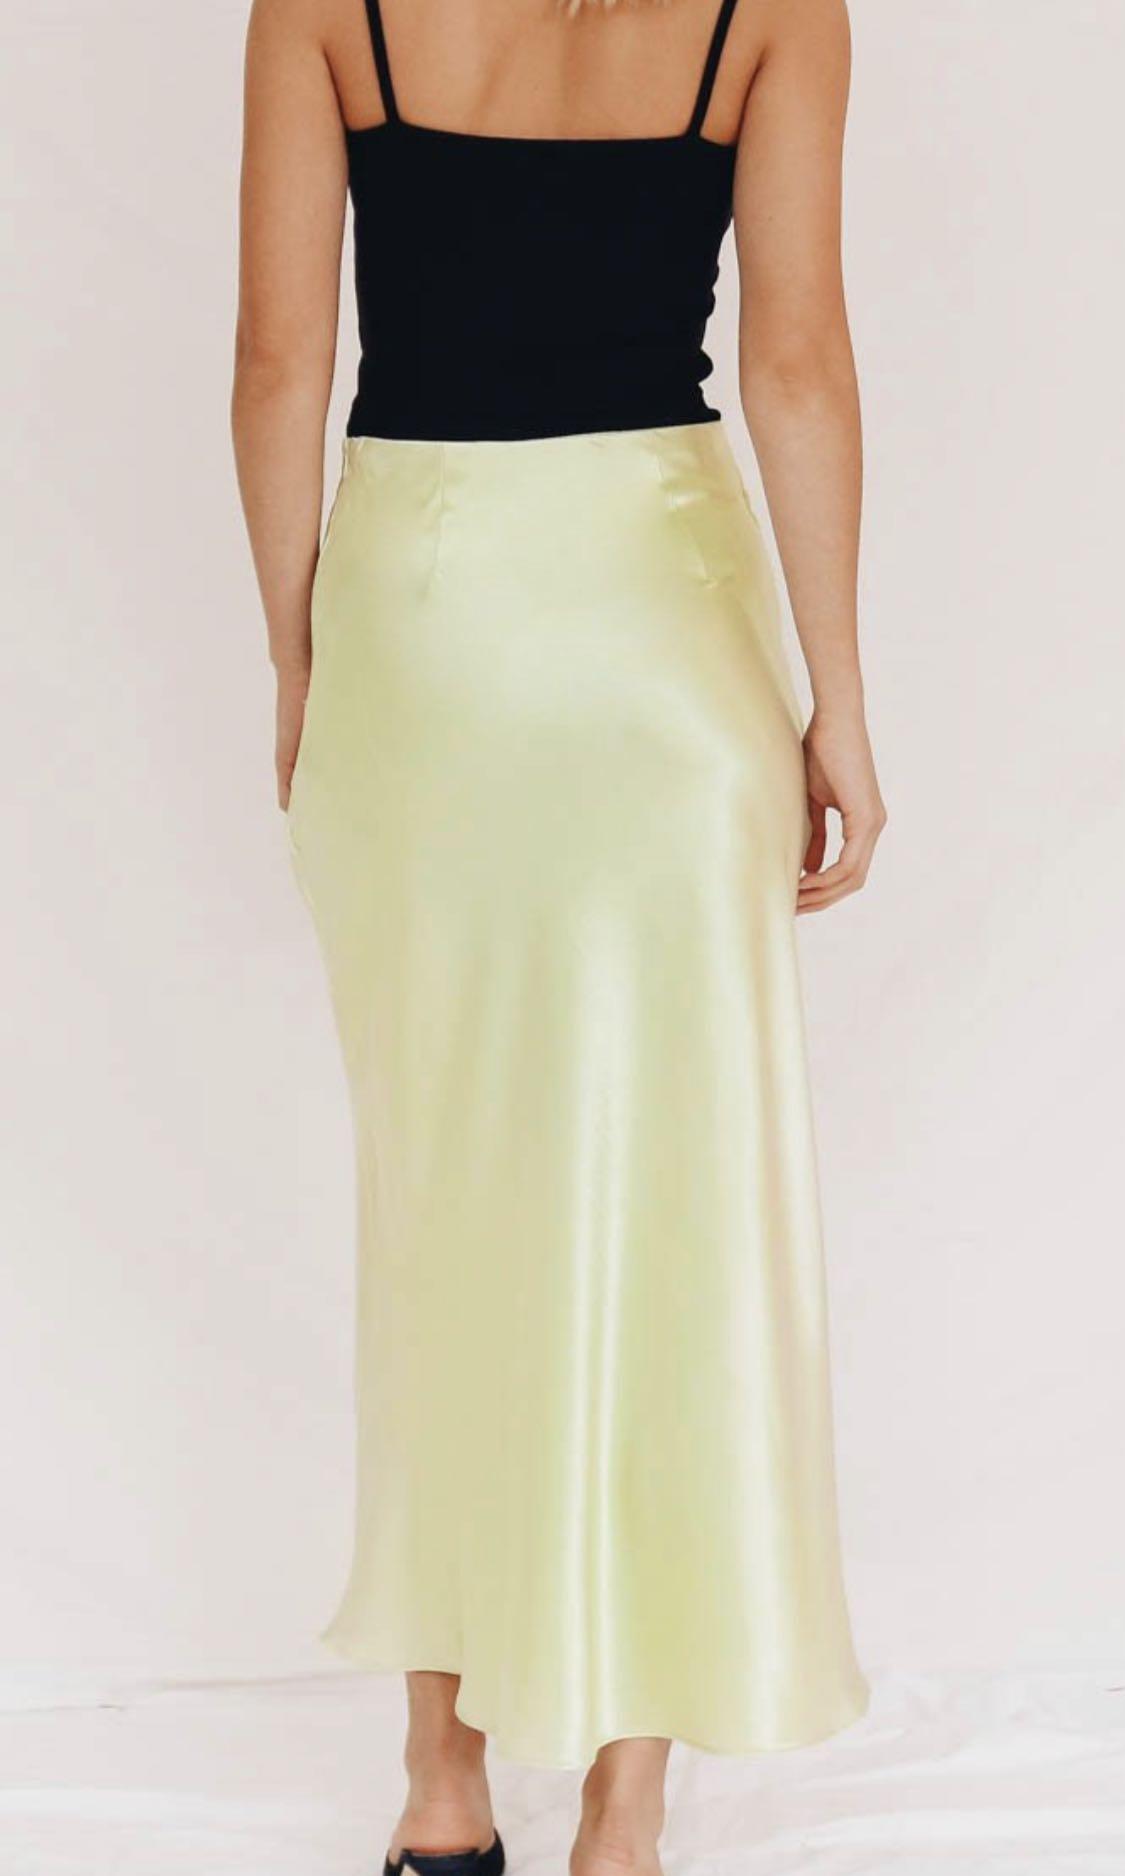 Verge Girl Bias Cut Midi Slip Skirt - Lime. Size 8